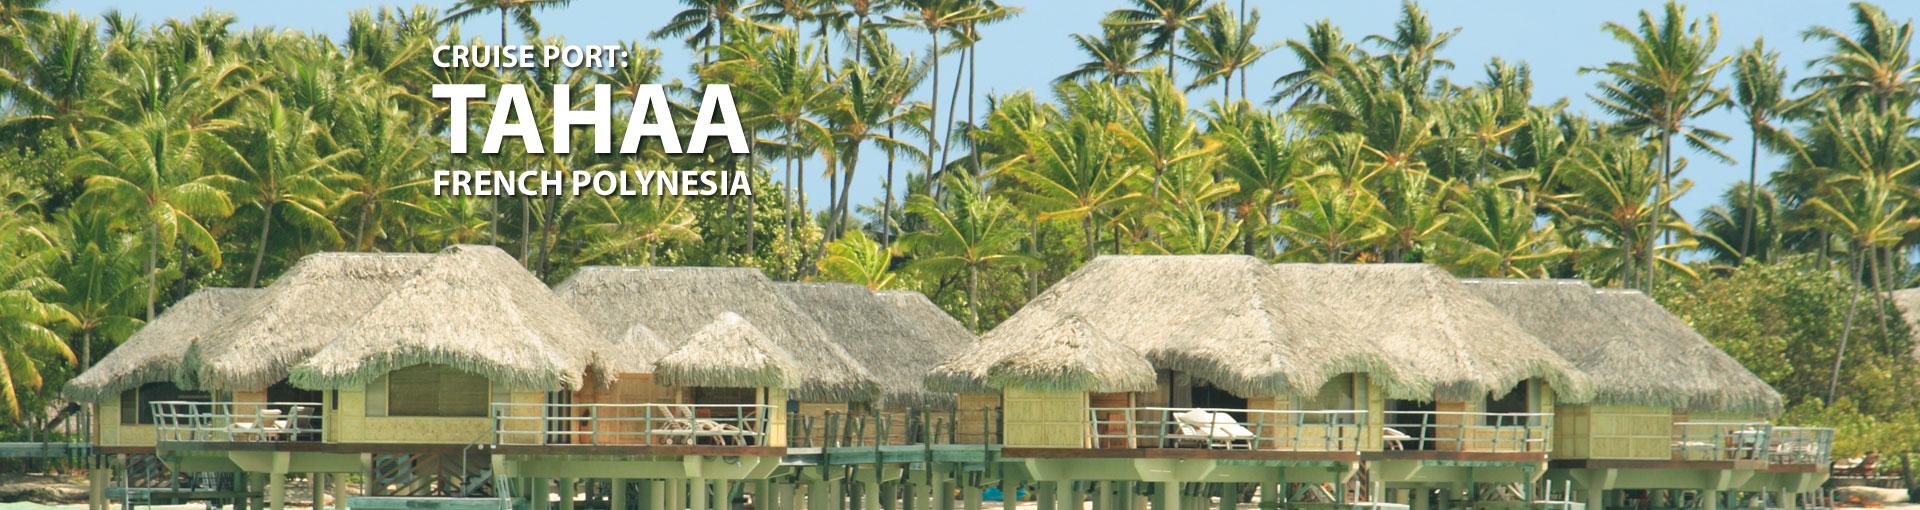 Cruises to Tahaa, French Polynesia